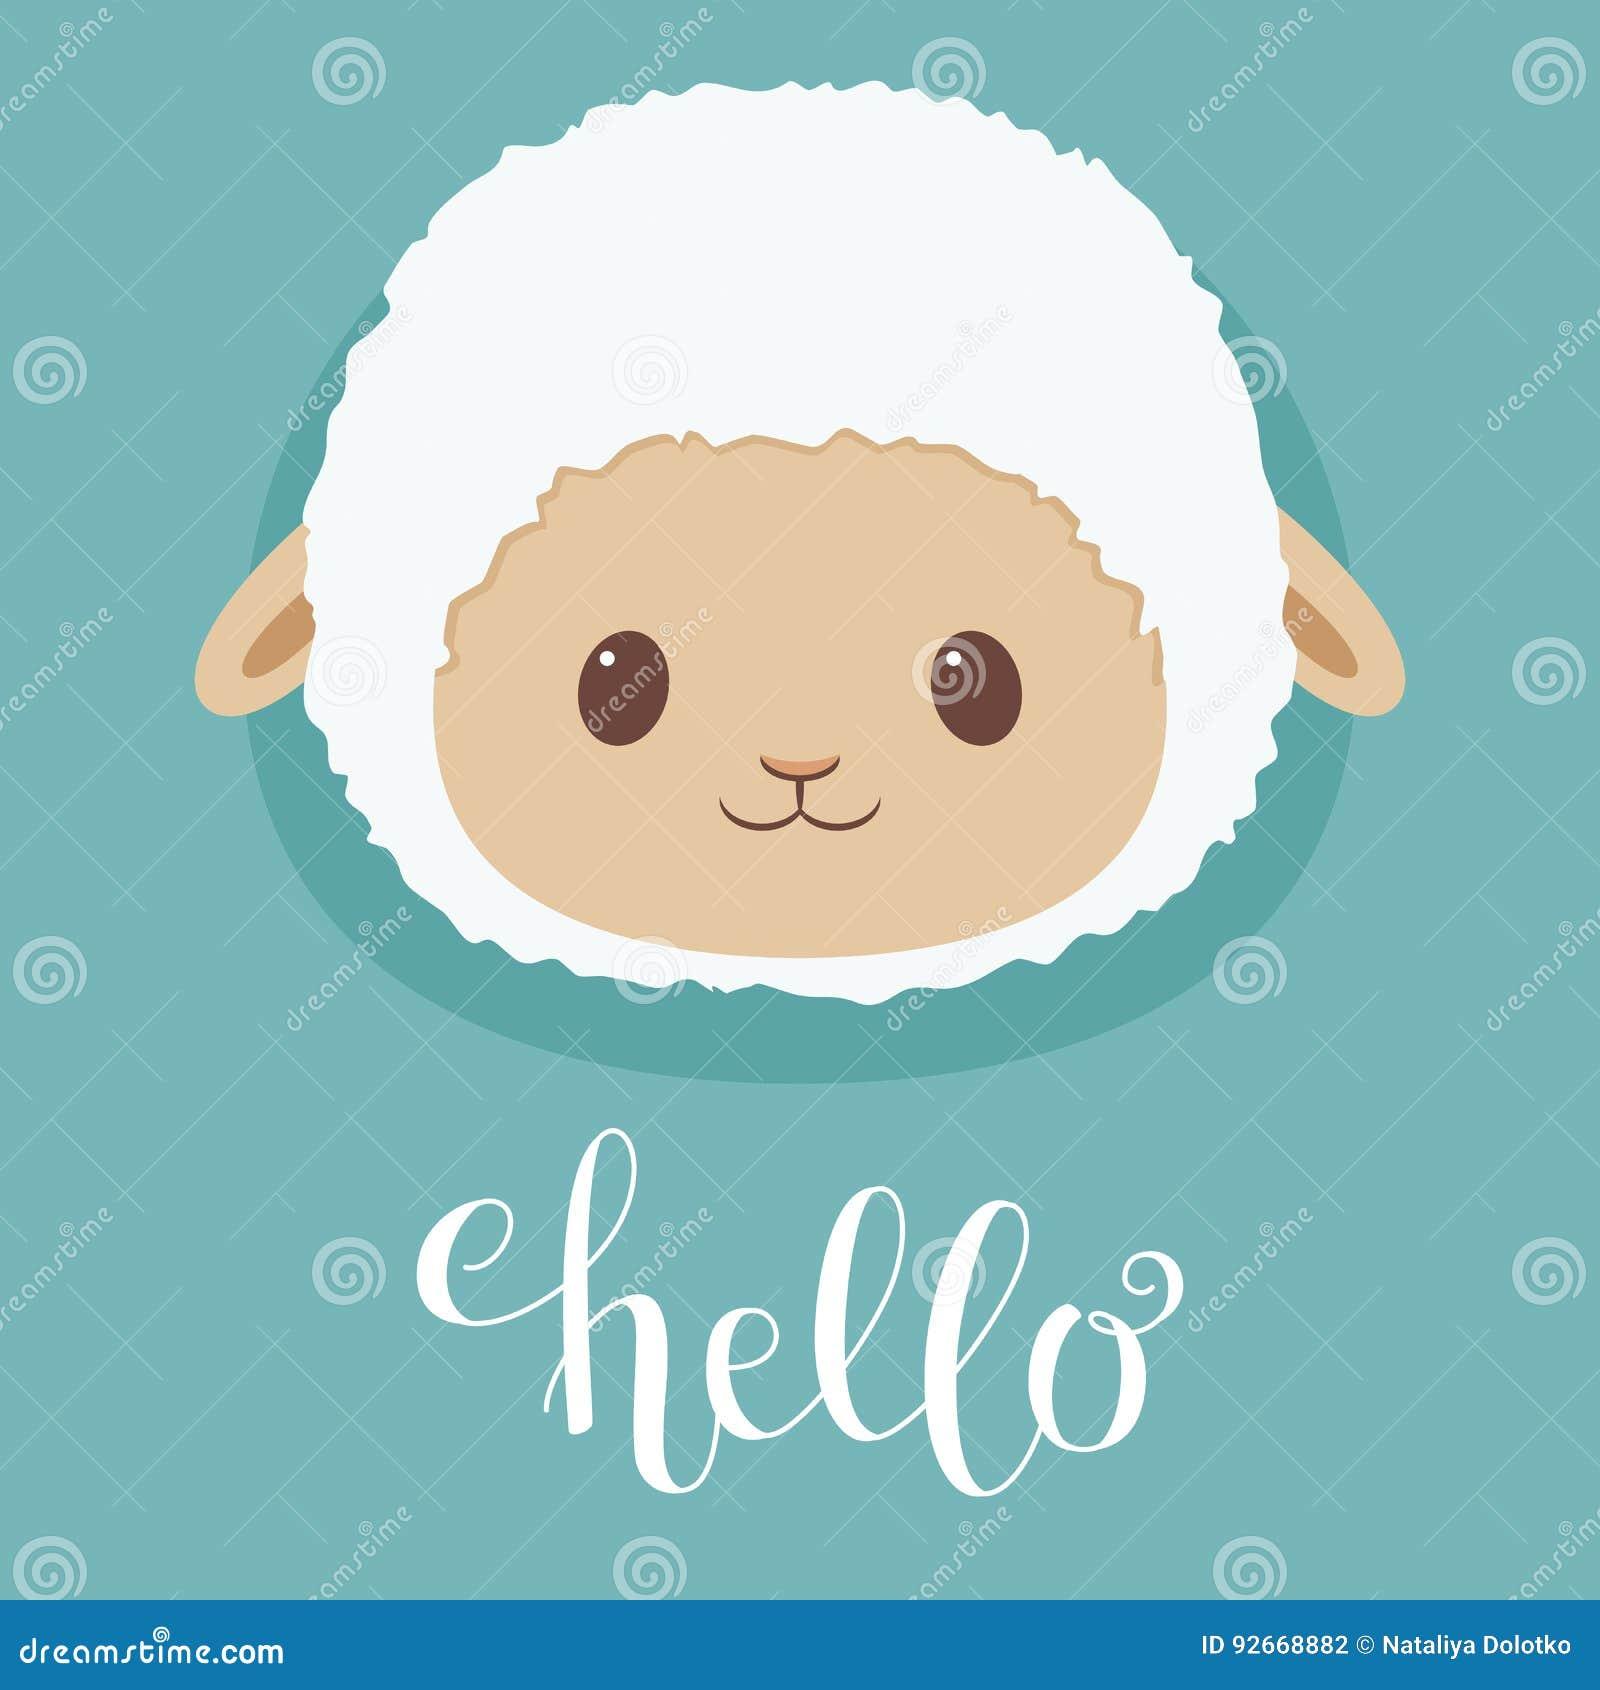 Cute Sheep Lamb Head Stock Vector Illustration Of Character 92668882